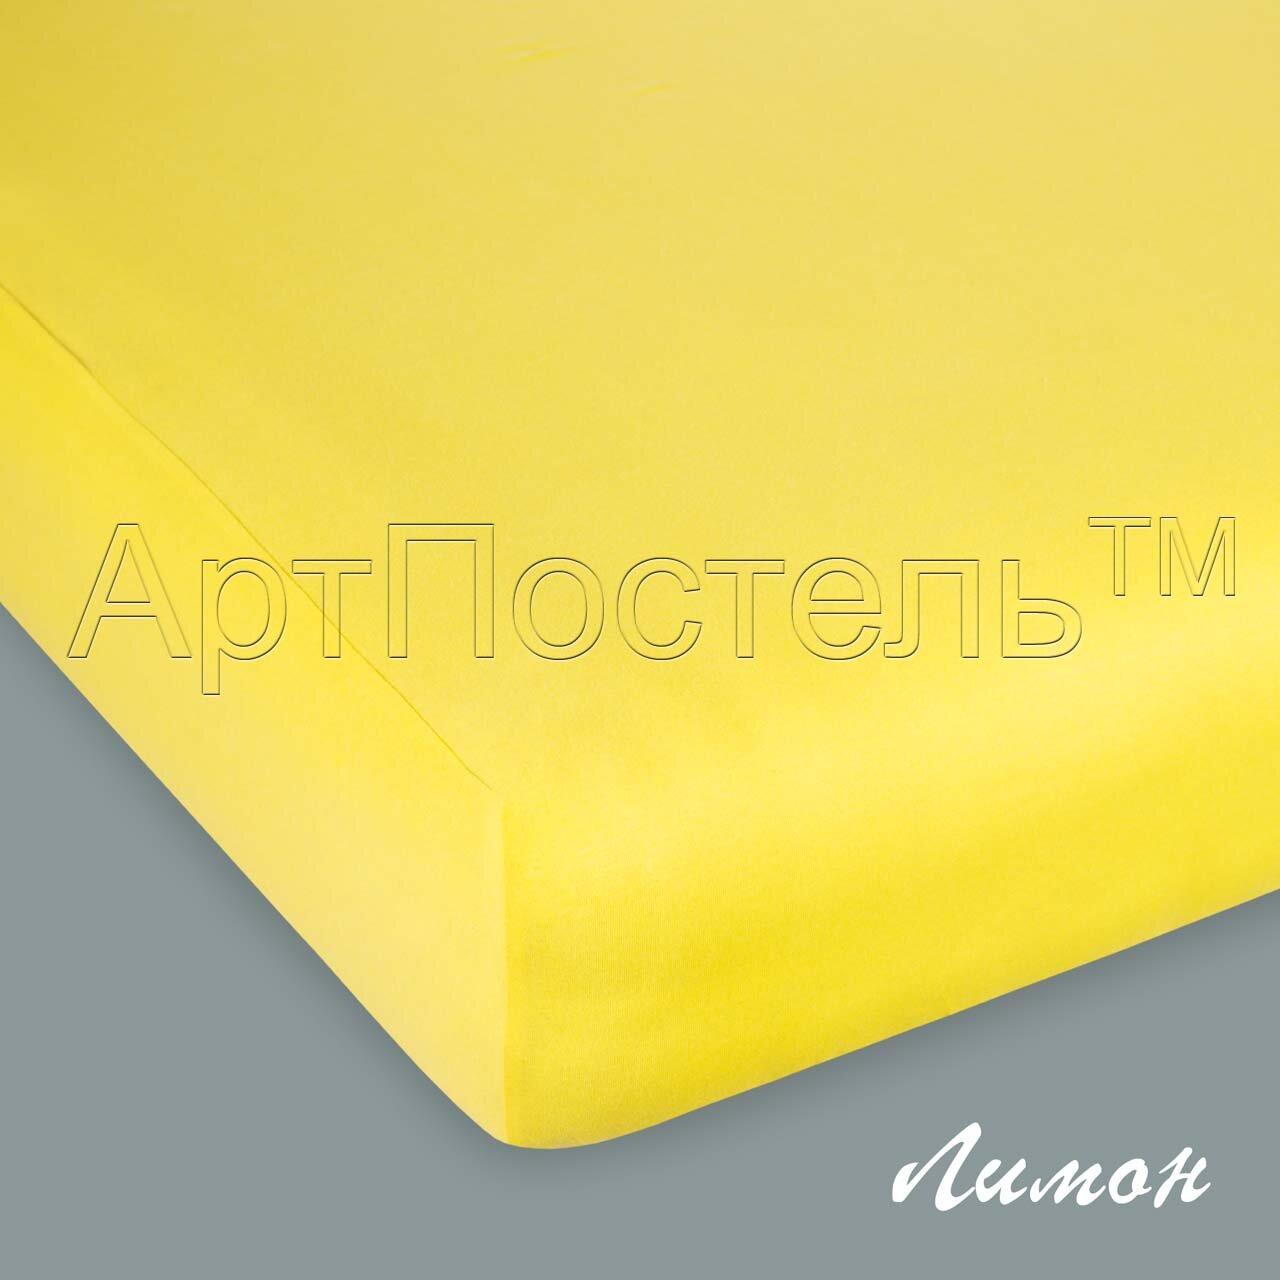 Простыня АртПостель На резинке Лимон размер 60х120 Кулирка